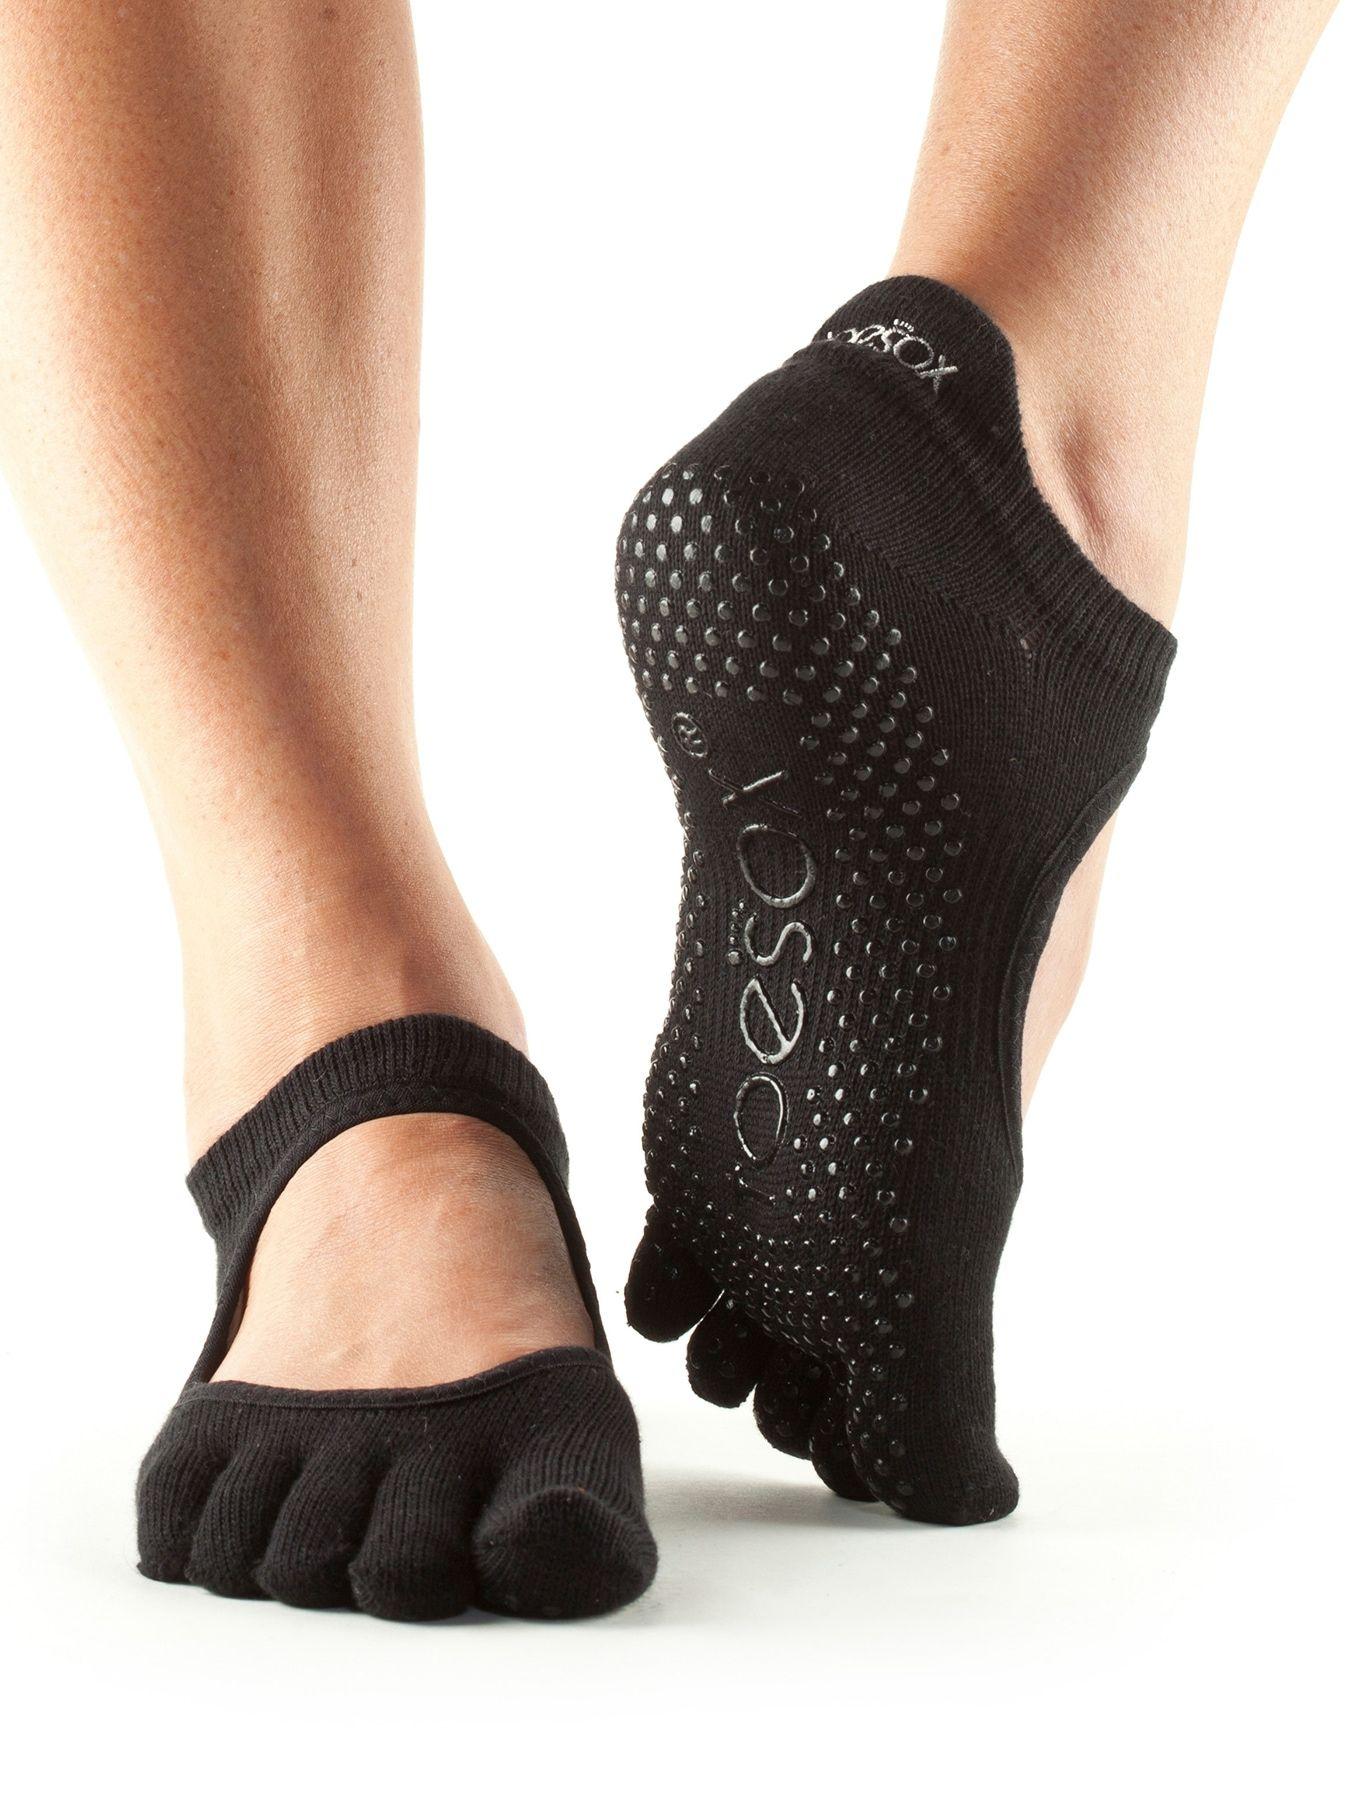 Grip Full Toe Ballerina By Toesox® Toesox, Grip socks